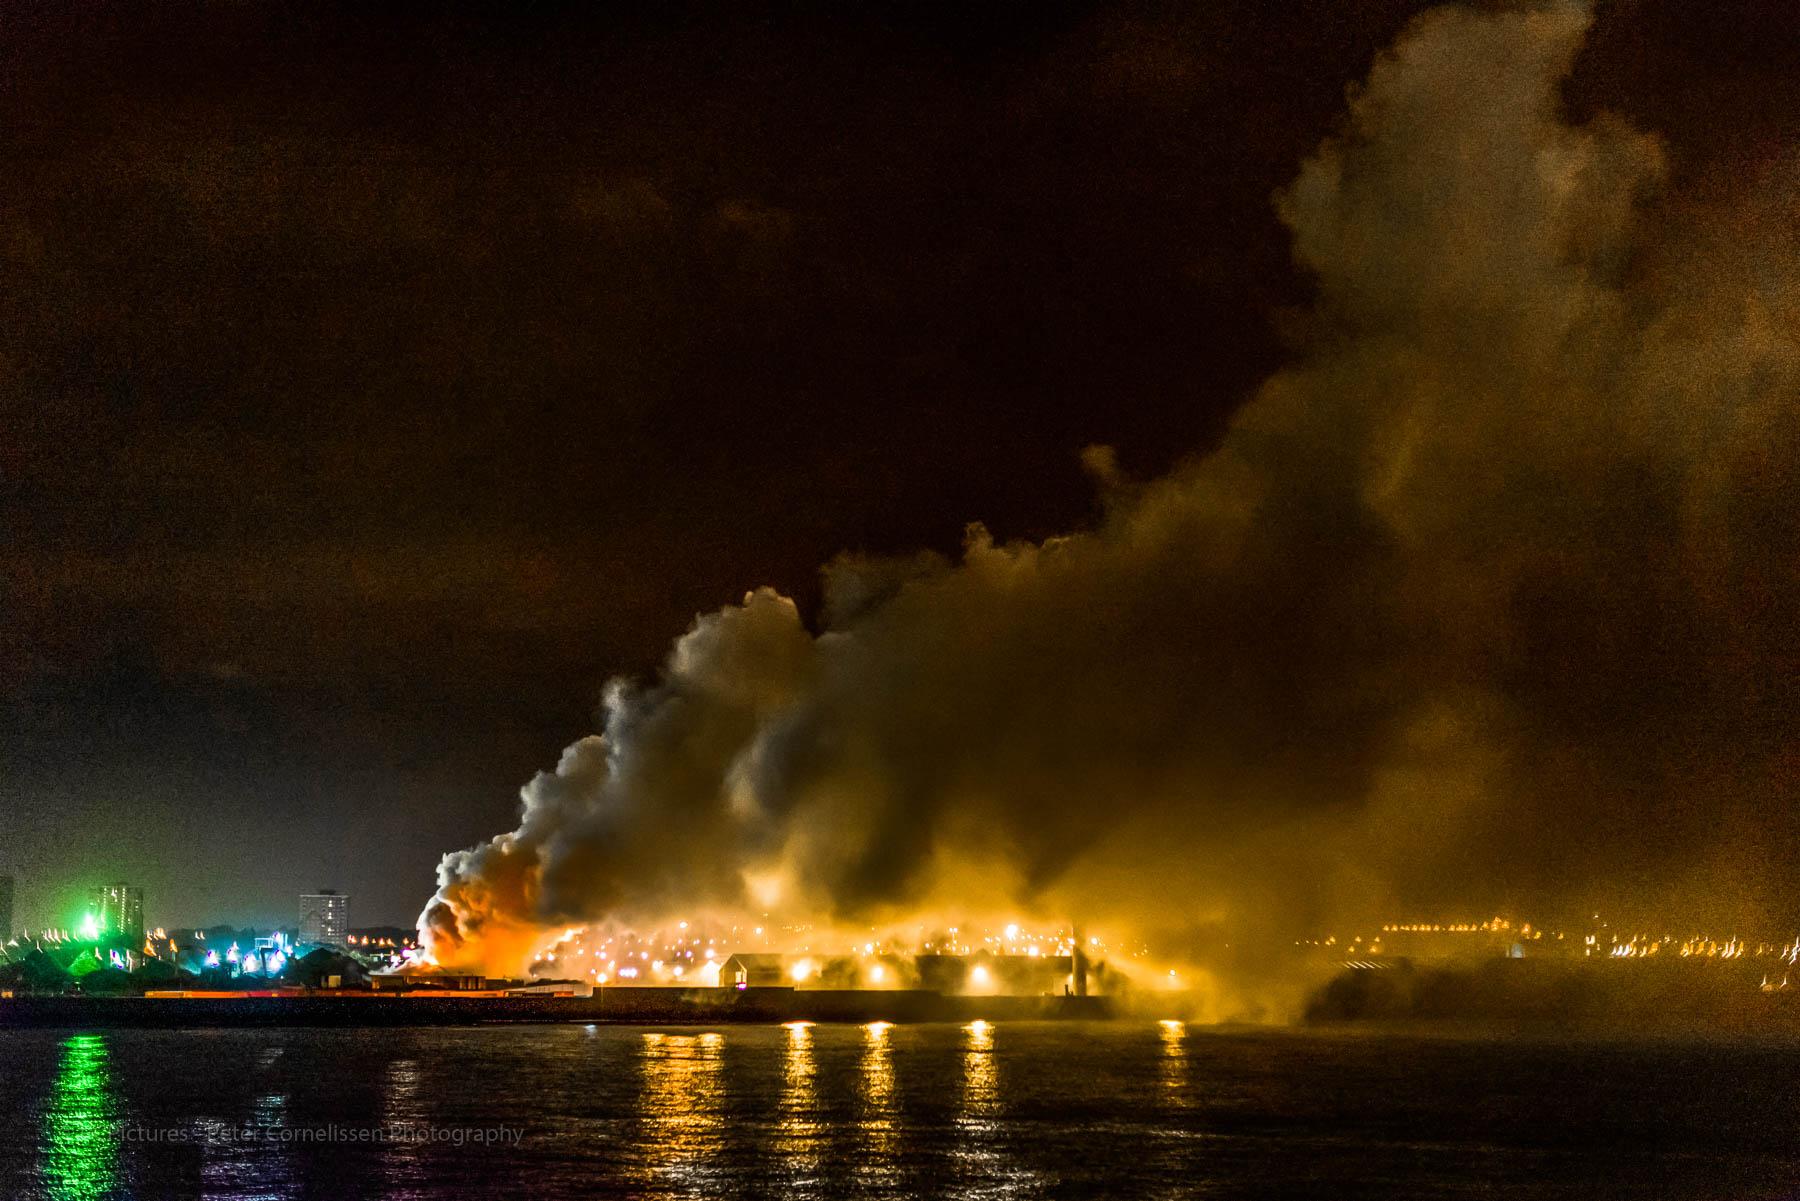 England, Foto catagoriëen, Landen, Liverpool, Seascape, United Kingdom, fire, zeegezicht